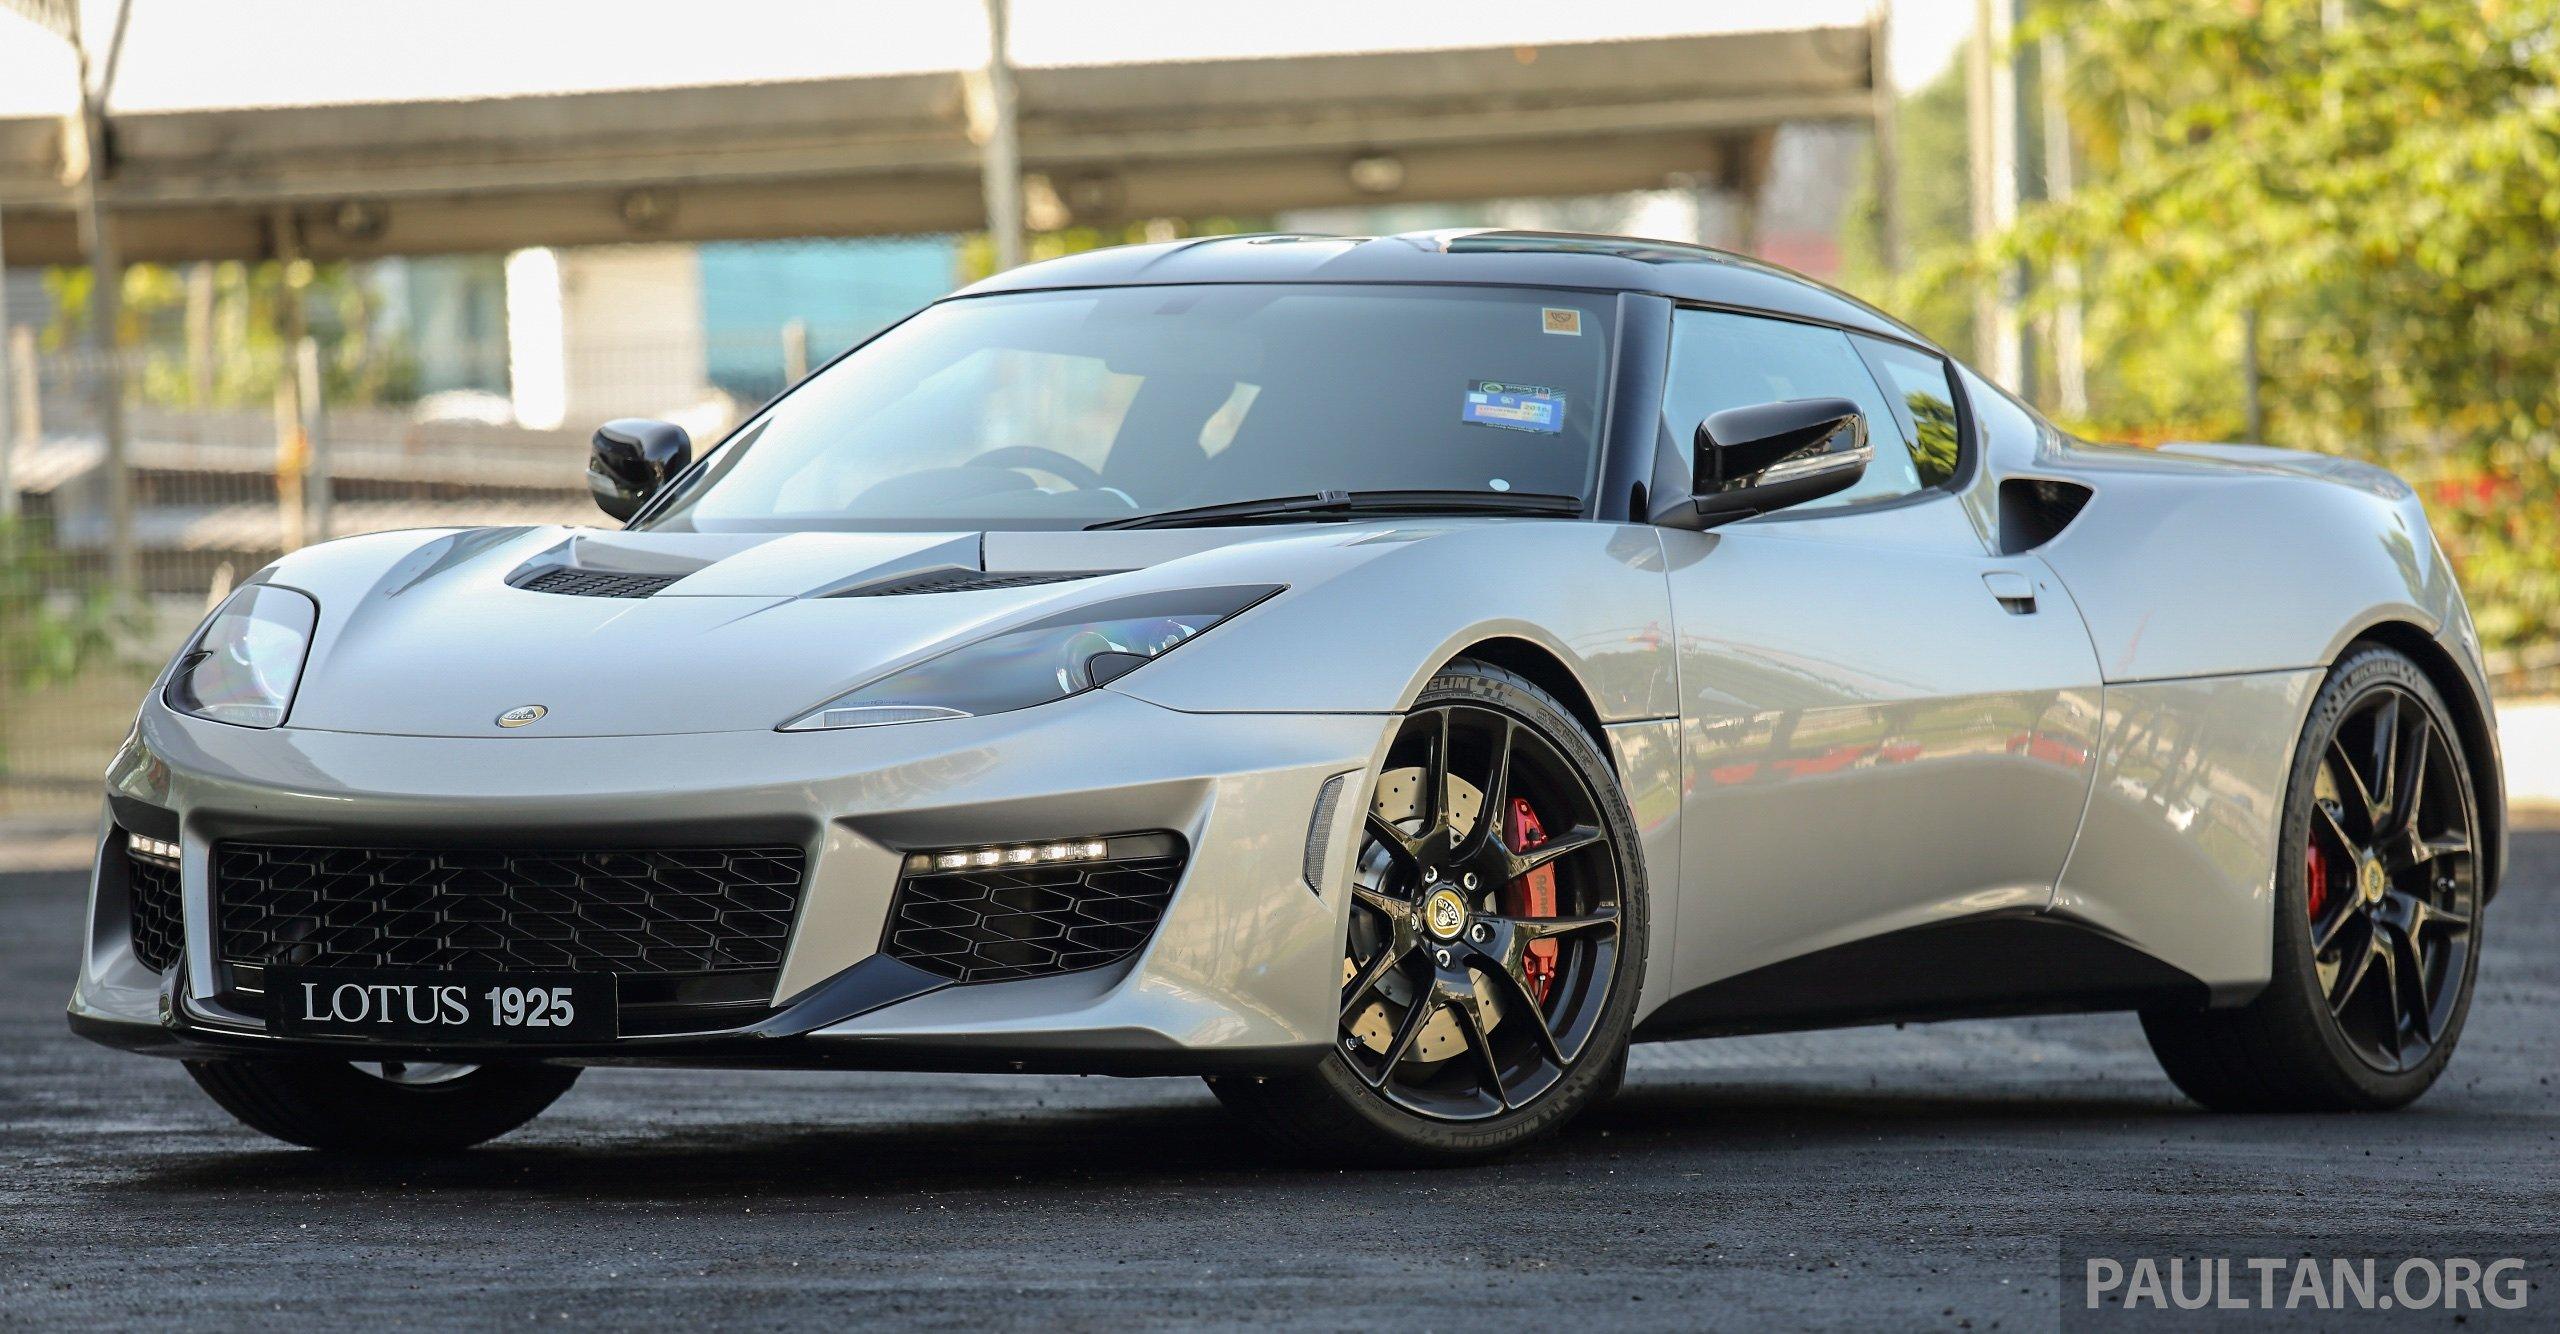 GALLERY: Lotus Evora 400 – Hethel's flagship in M'sia Image ...